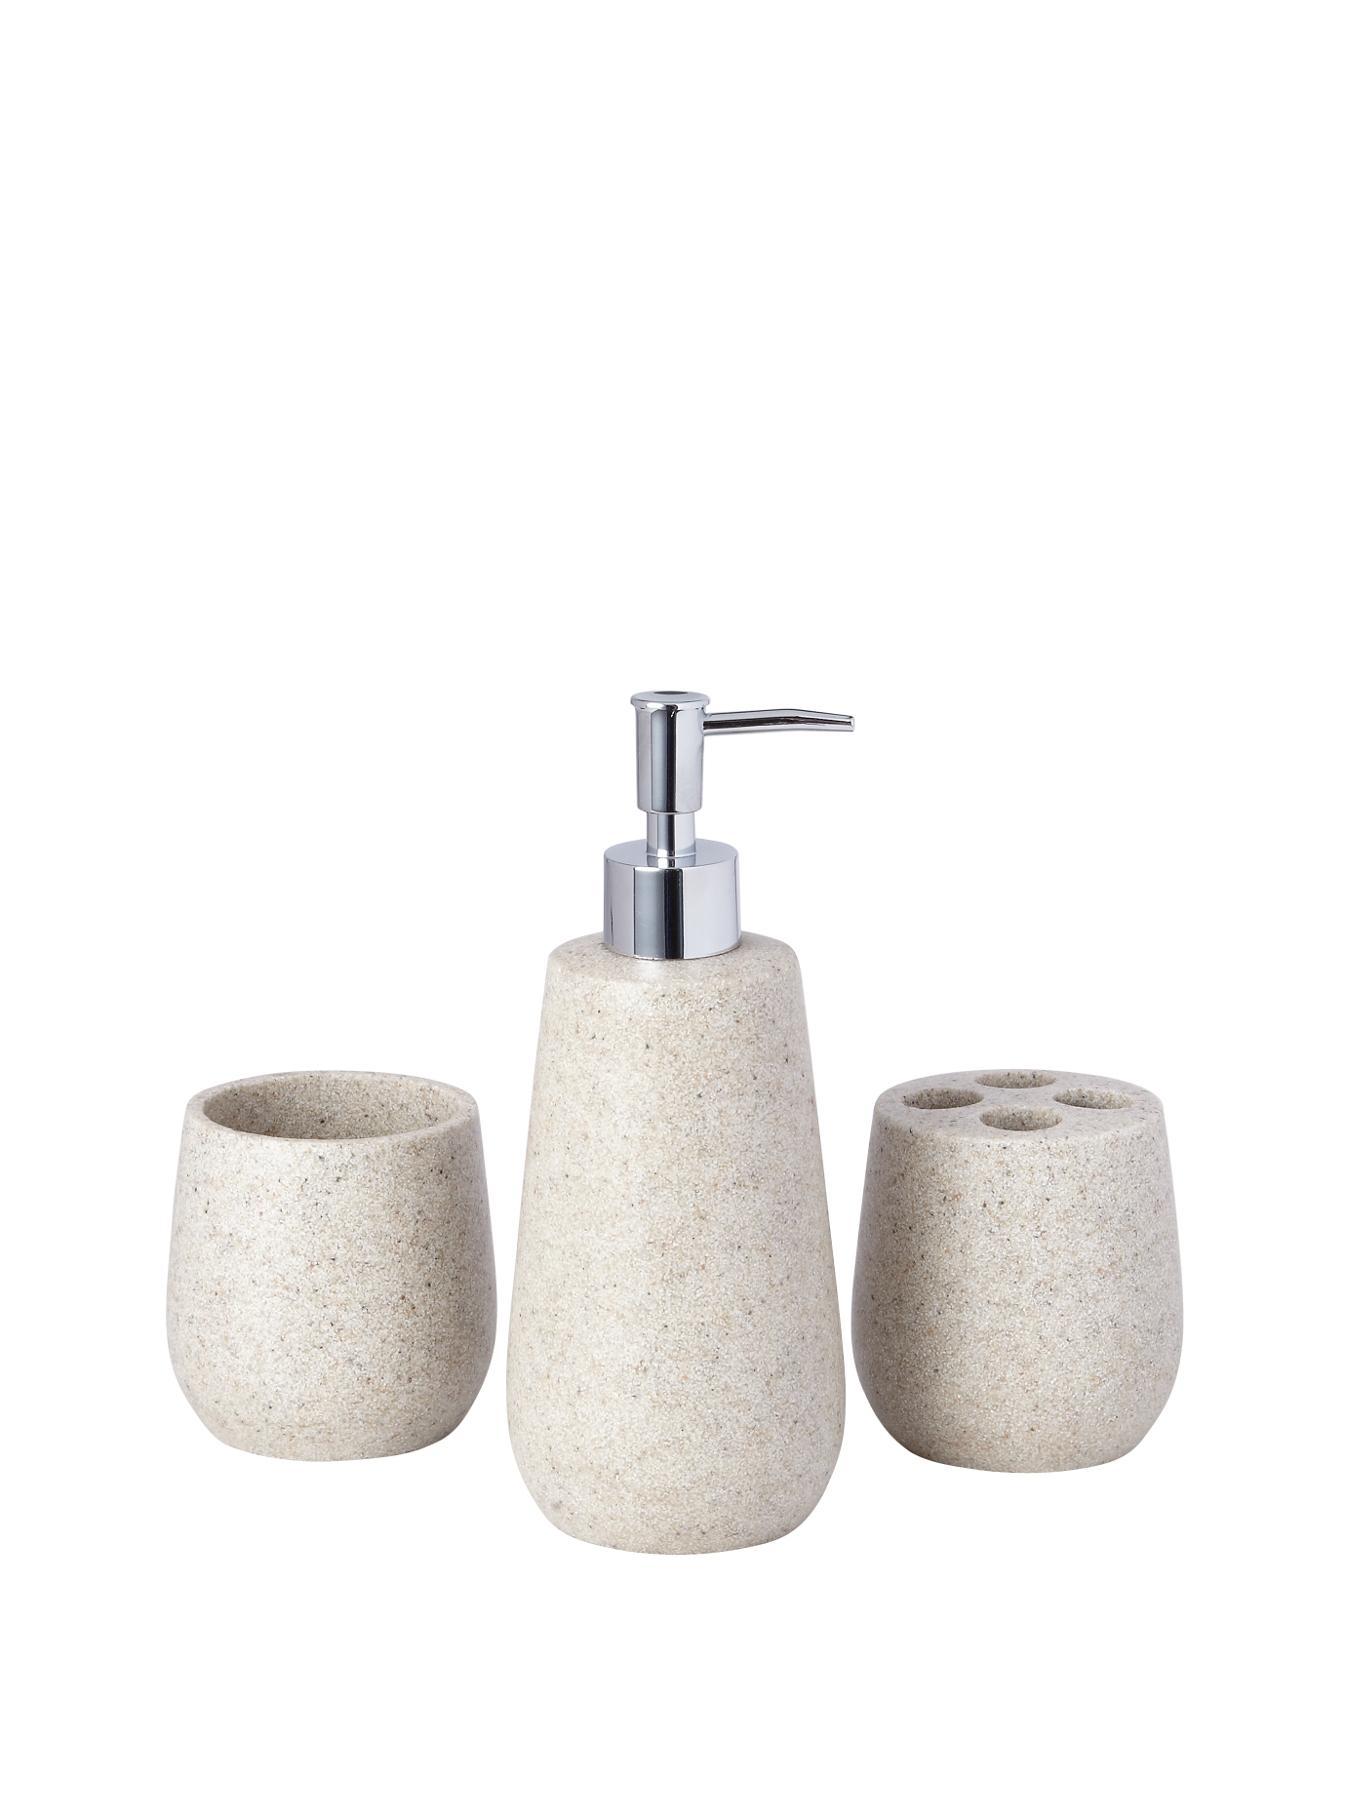 StoneEffect 3Piece Bathroom Accessory Set  verycouk